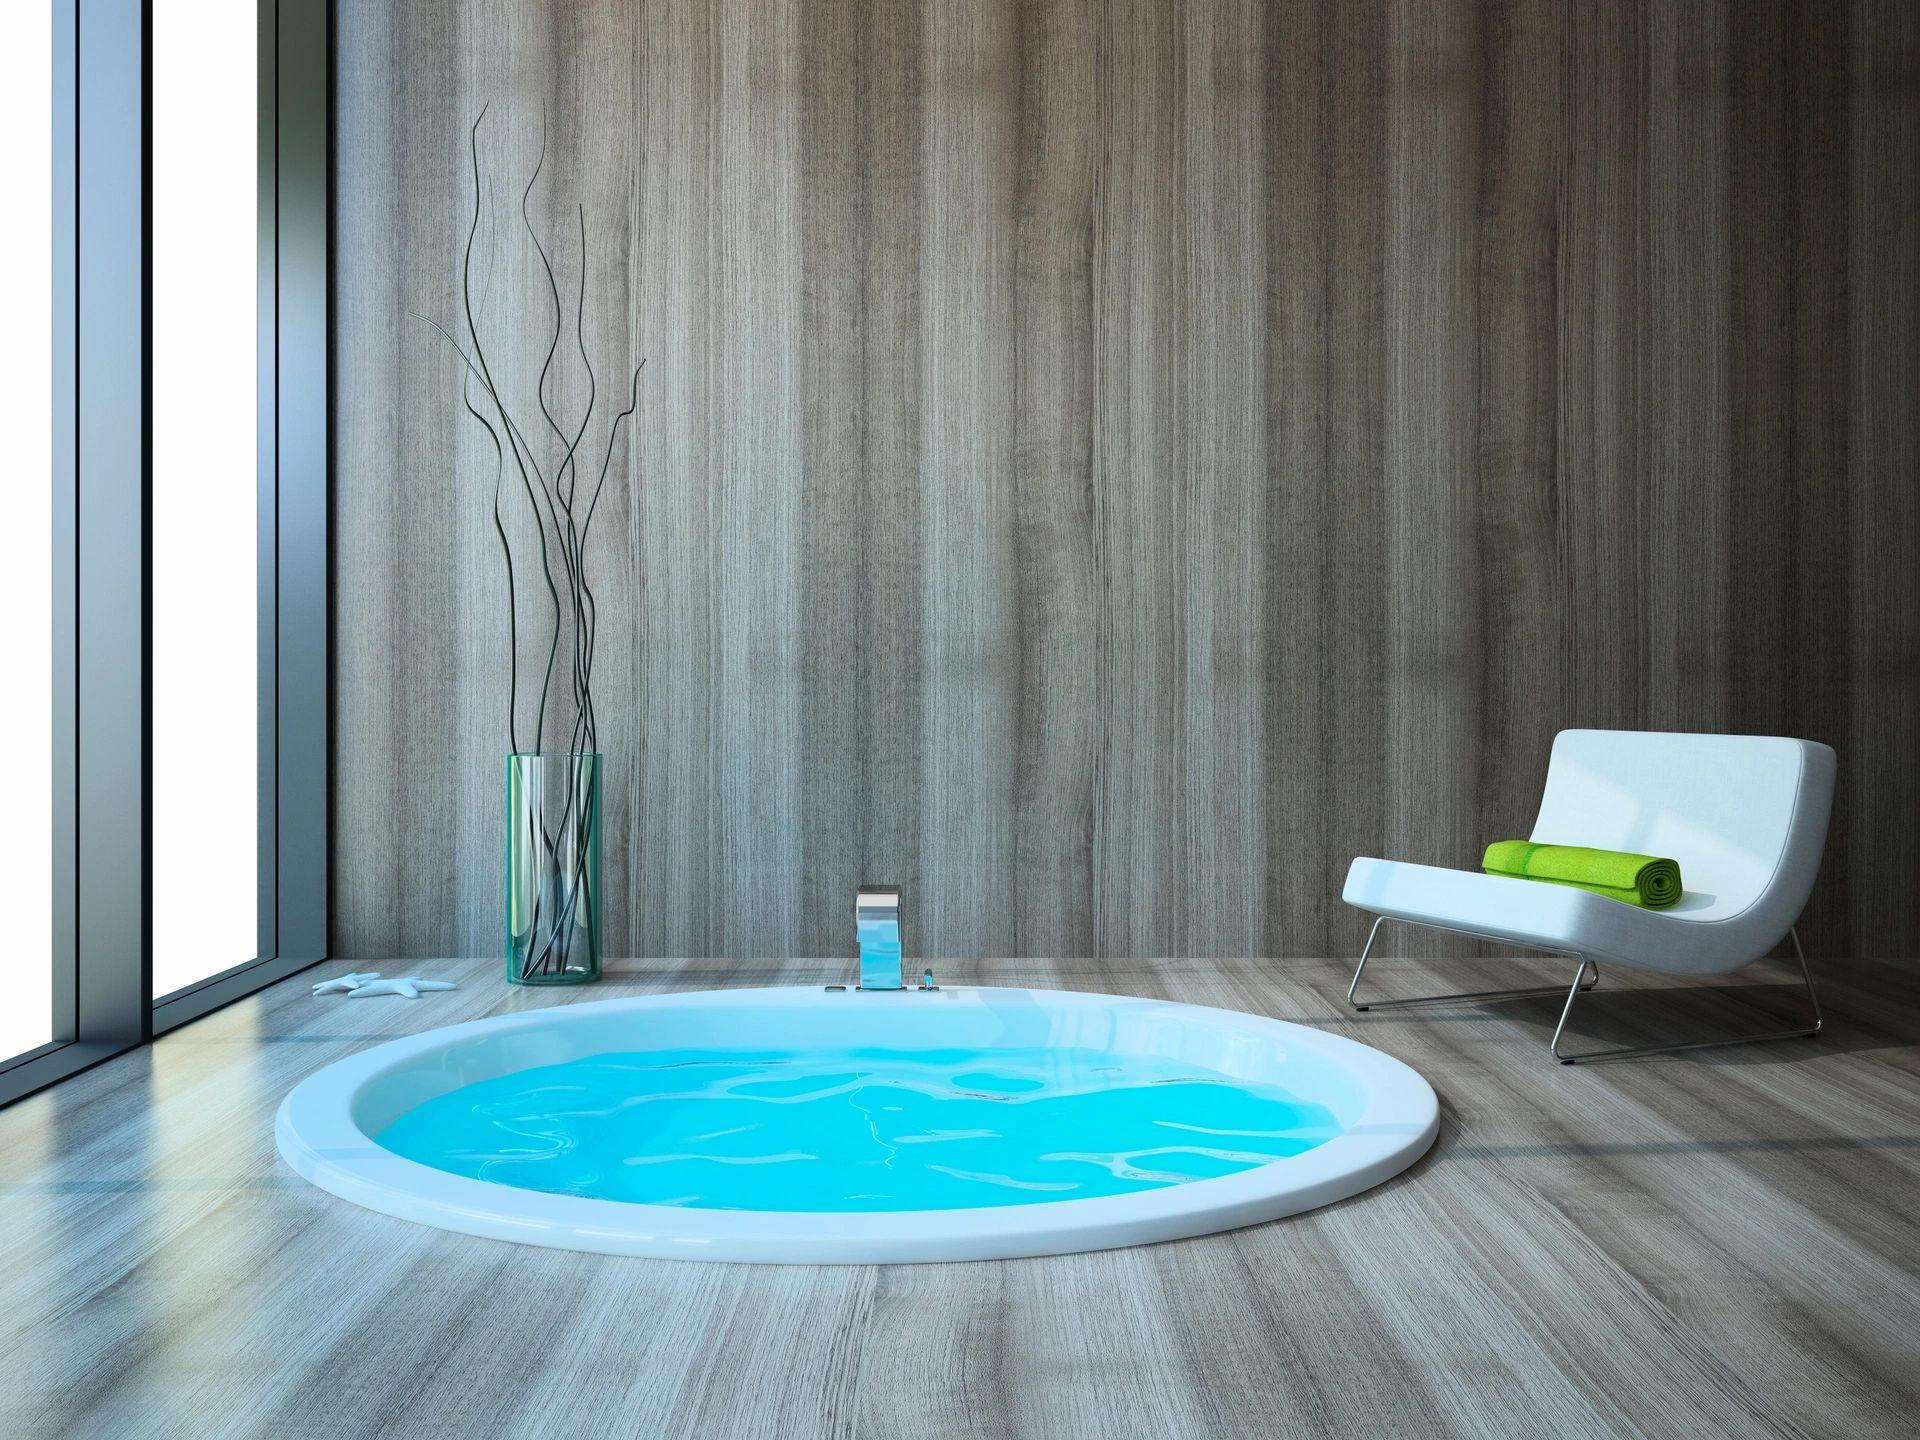 Greens Pools of Tupelo - Swimming Pools, Spas | Greens Pools ...